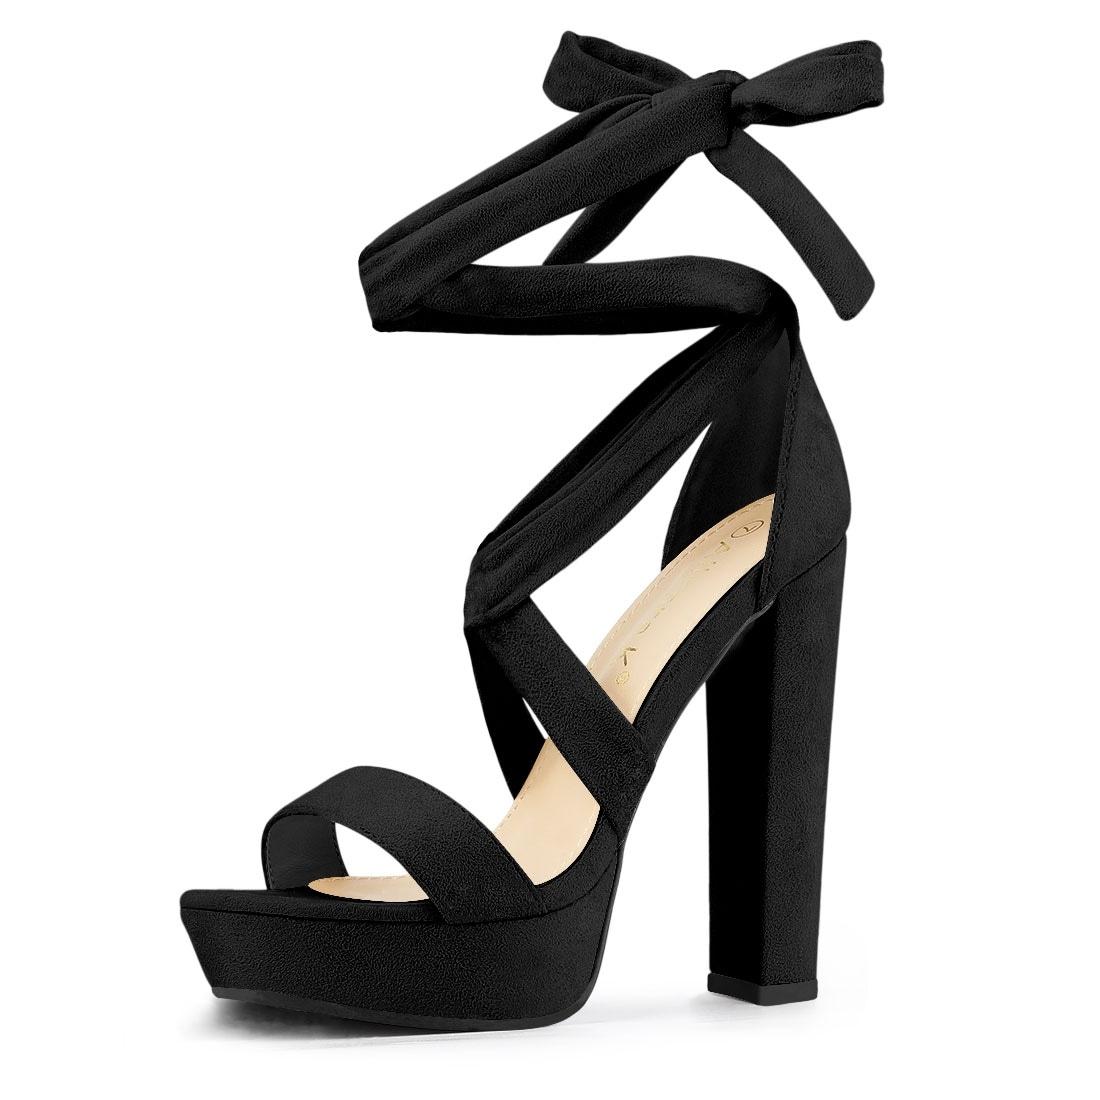 Lace Up Platform Heels Sandals